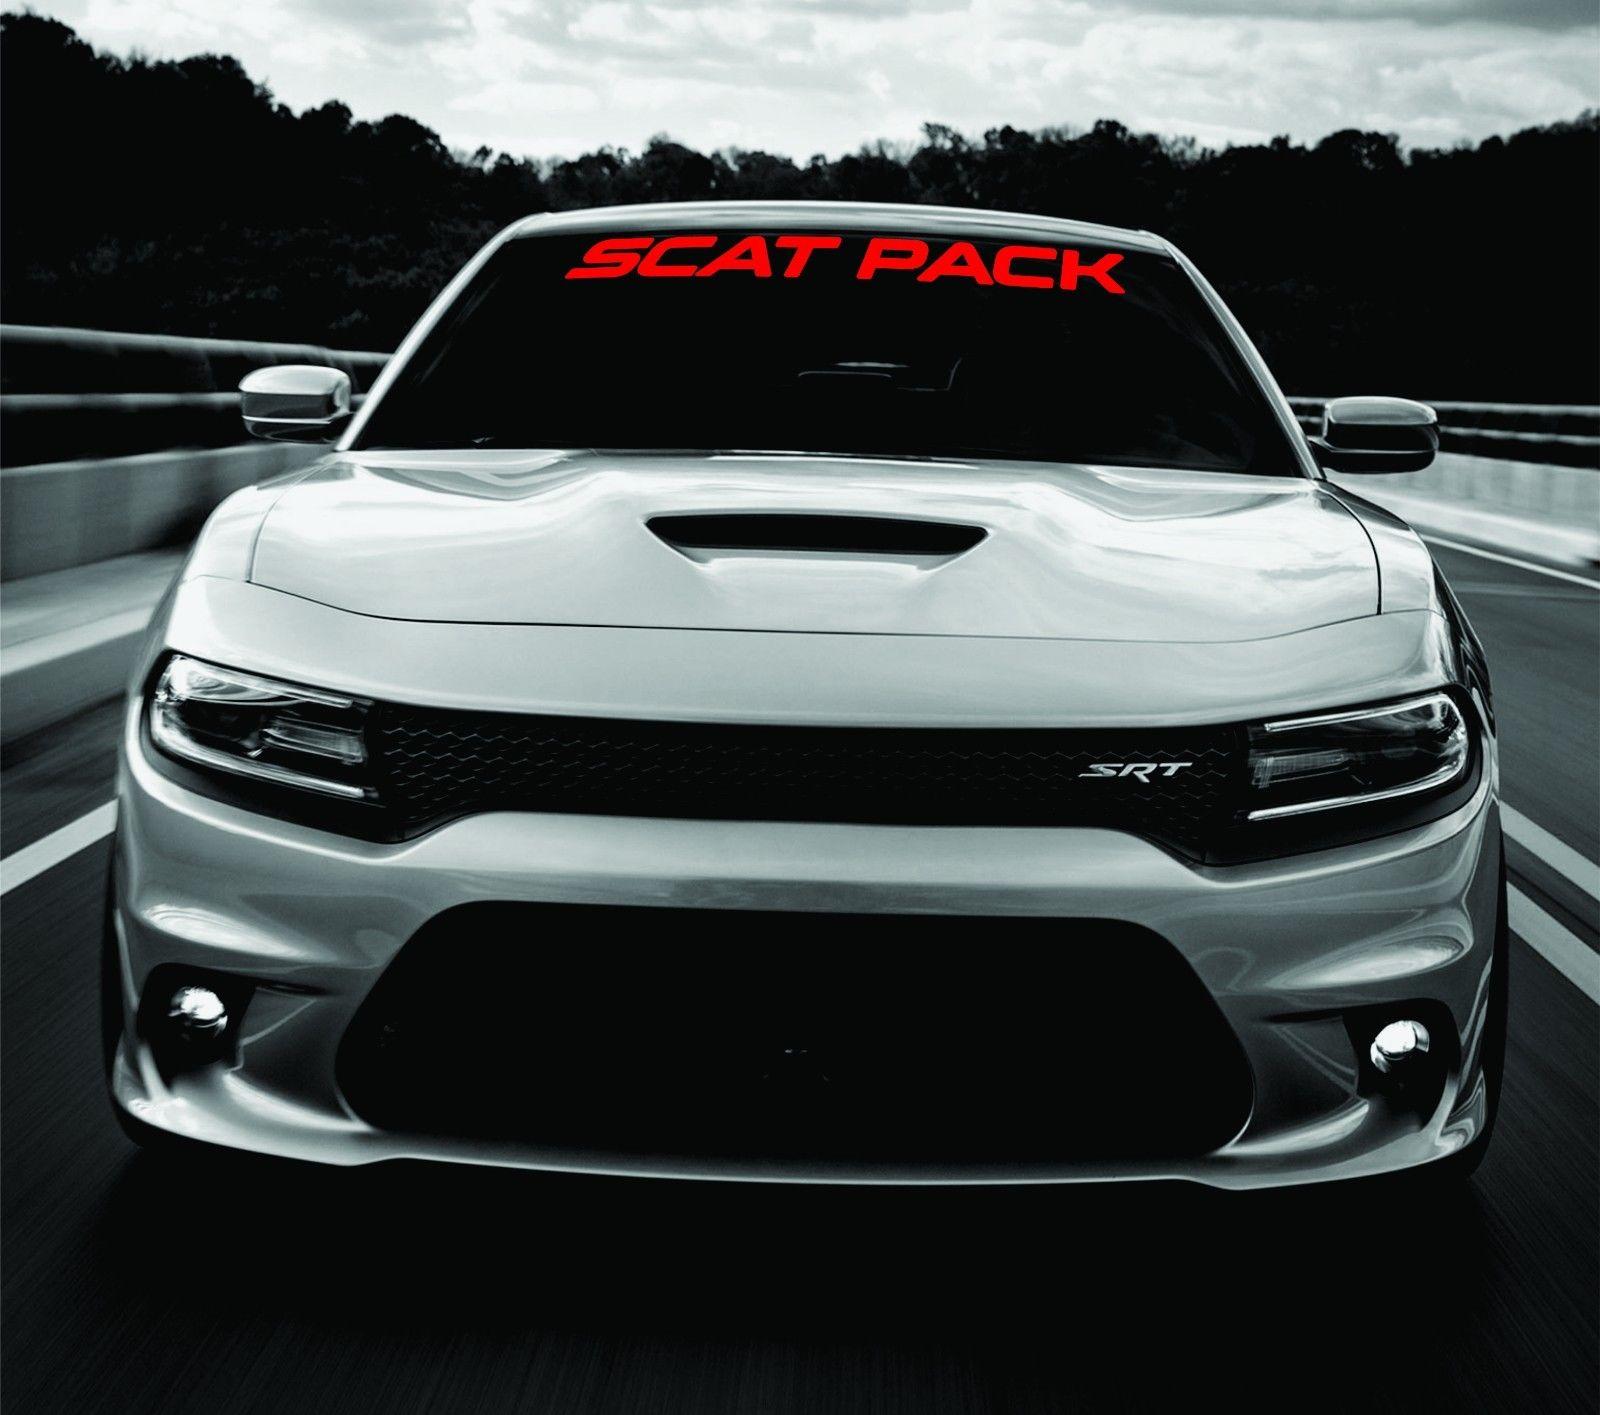 Dodge Charger SCAT PACK Windschutzscheibe Banner Aufkleber 2011-2017 SRT MOPAR 392 Scatpack